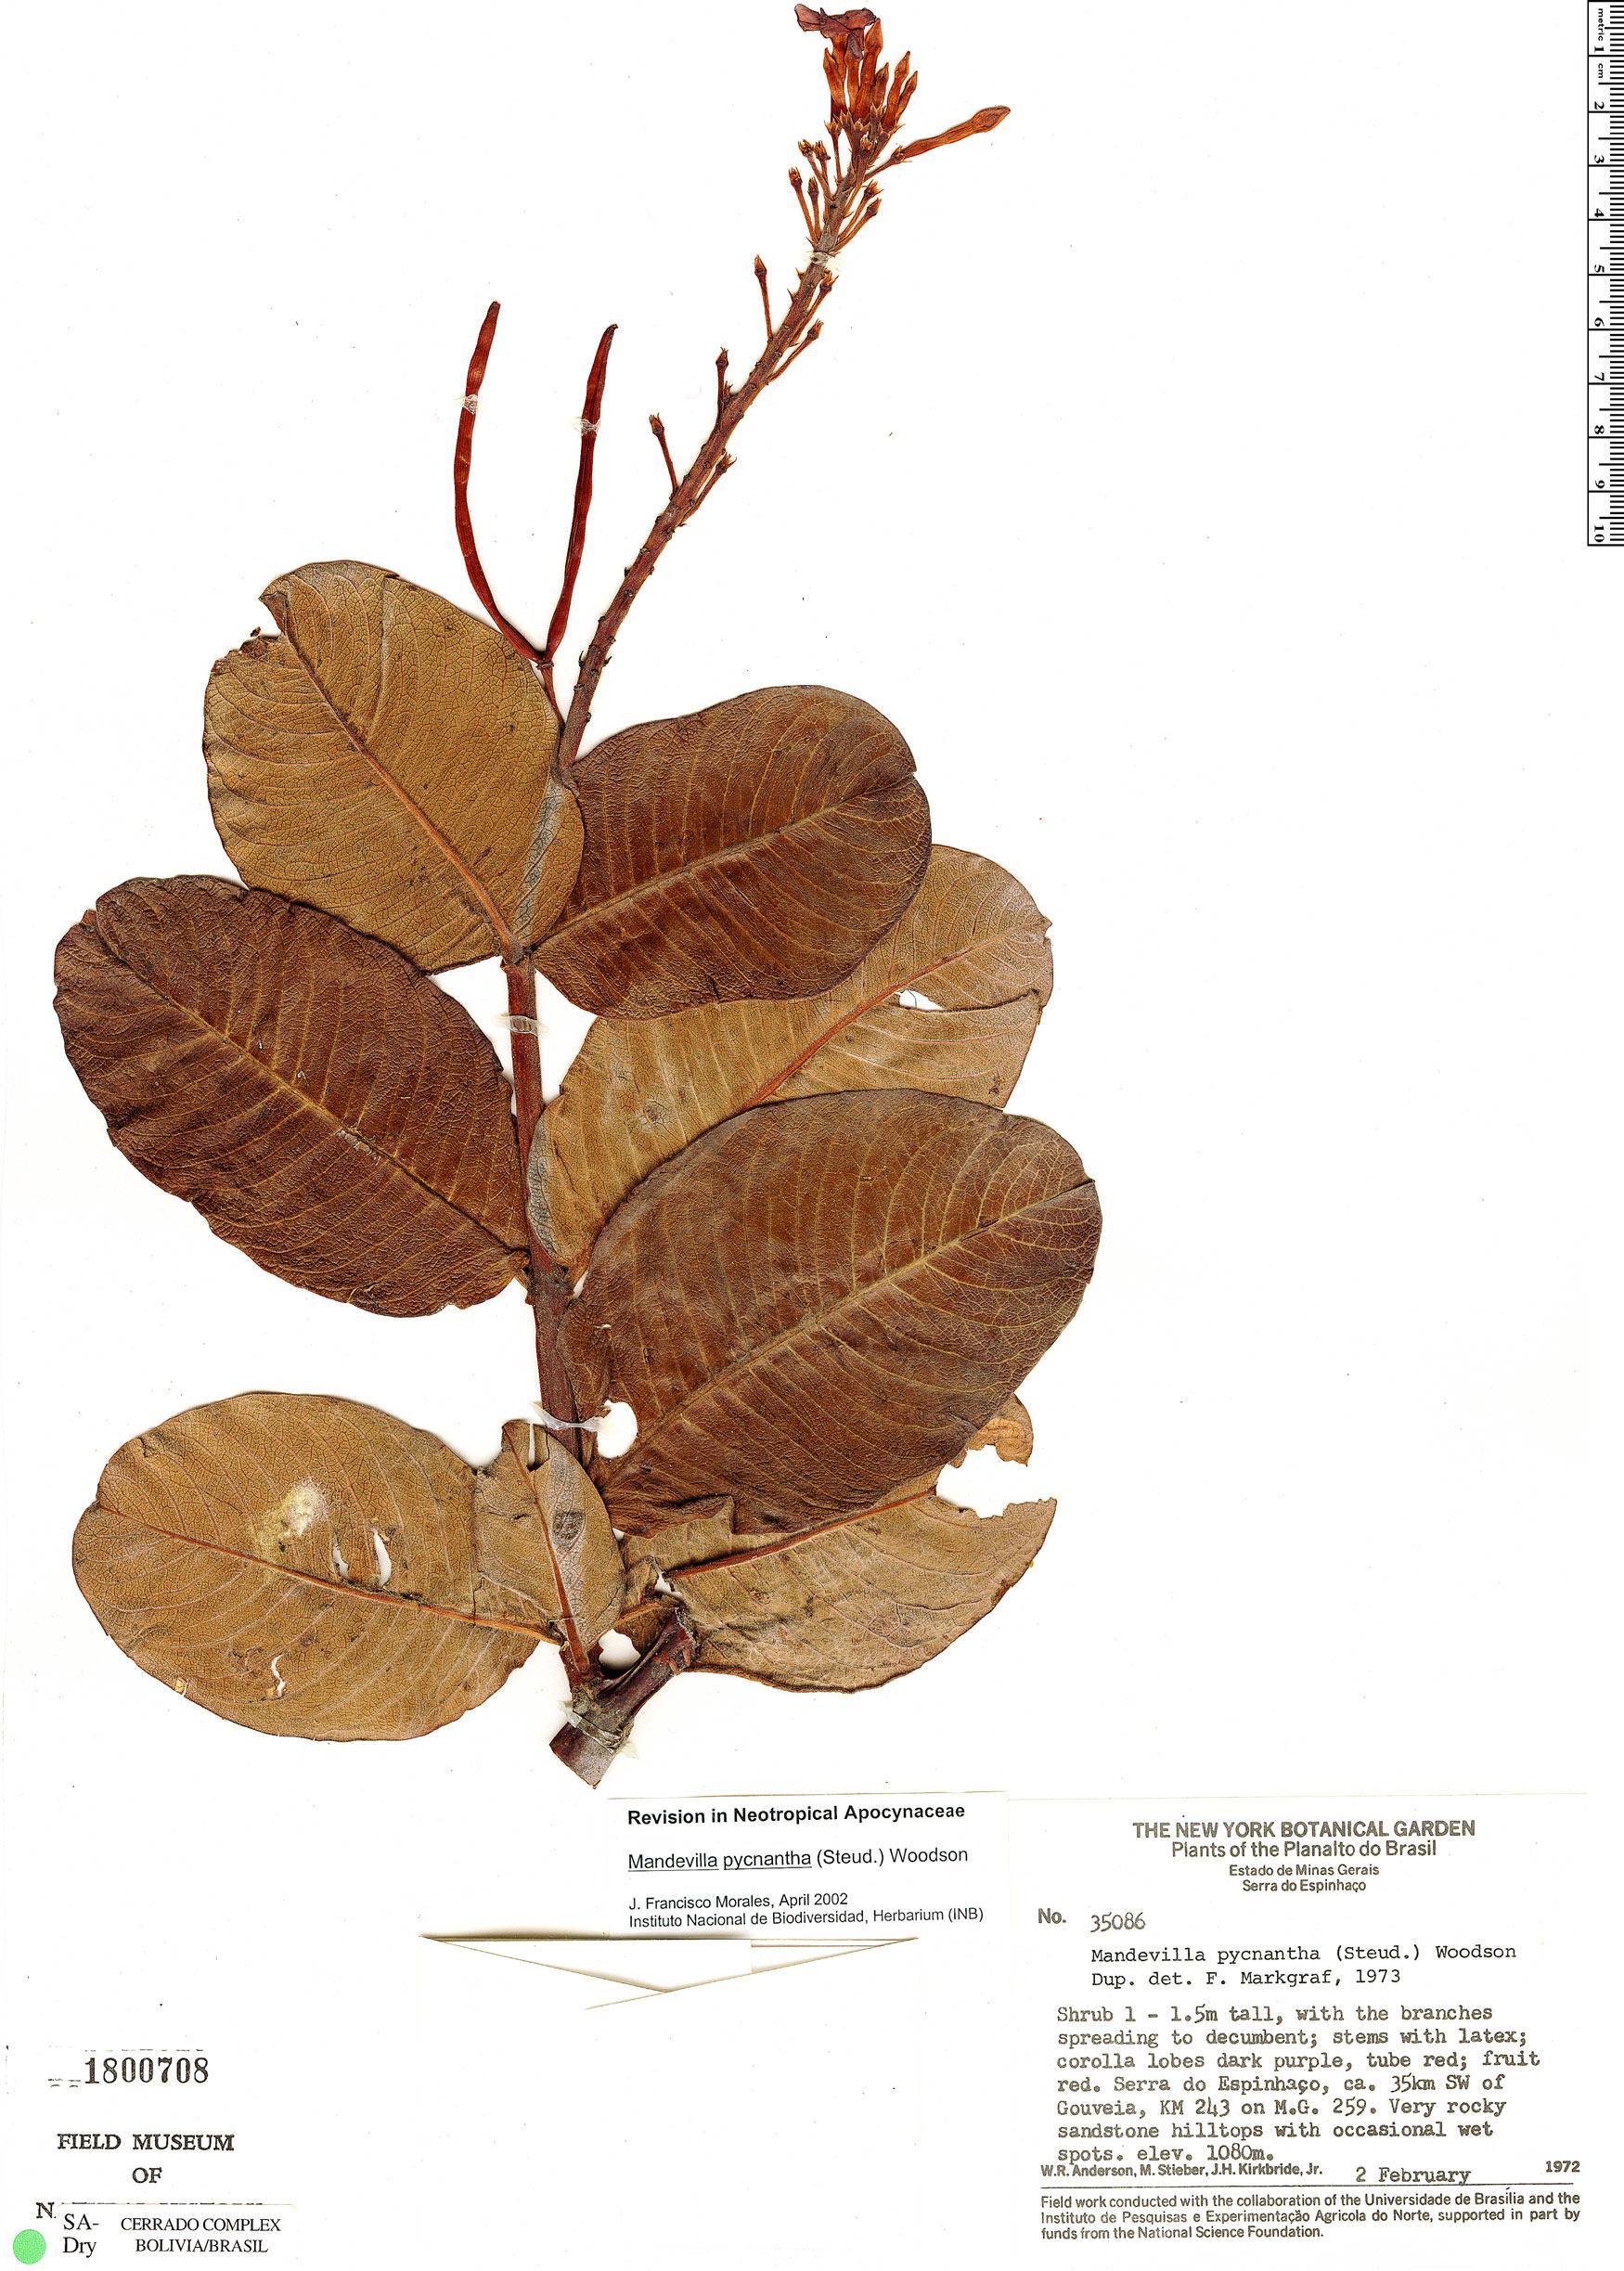 Specimen: Mandevilla pycnantha